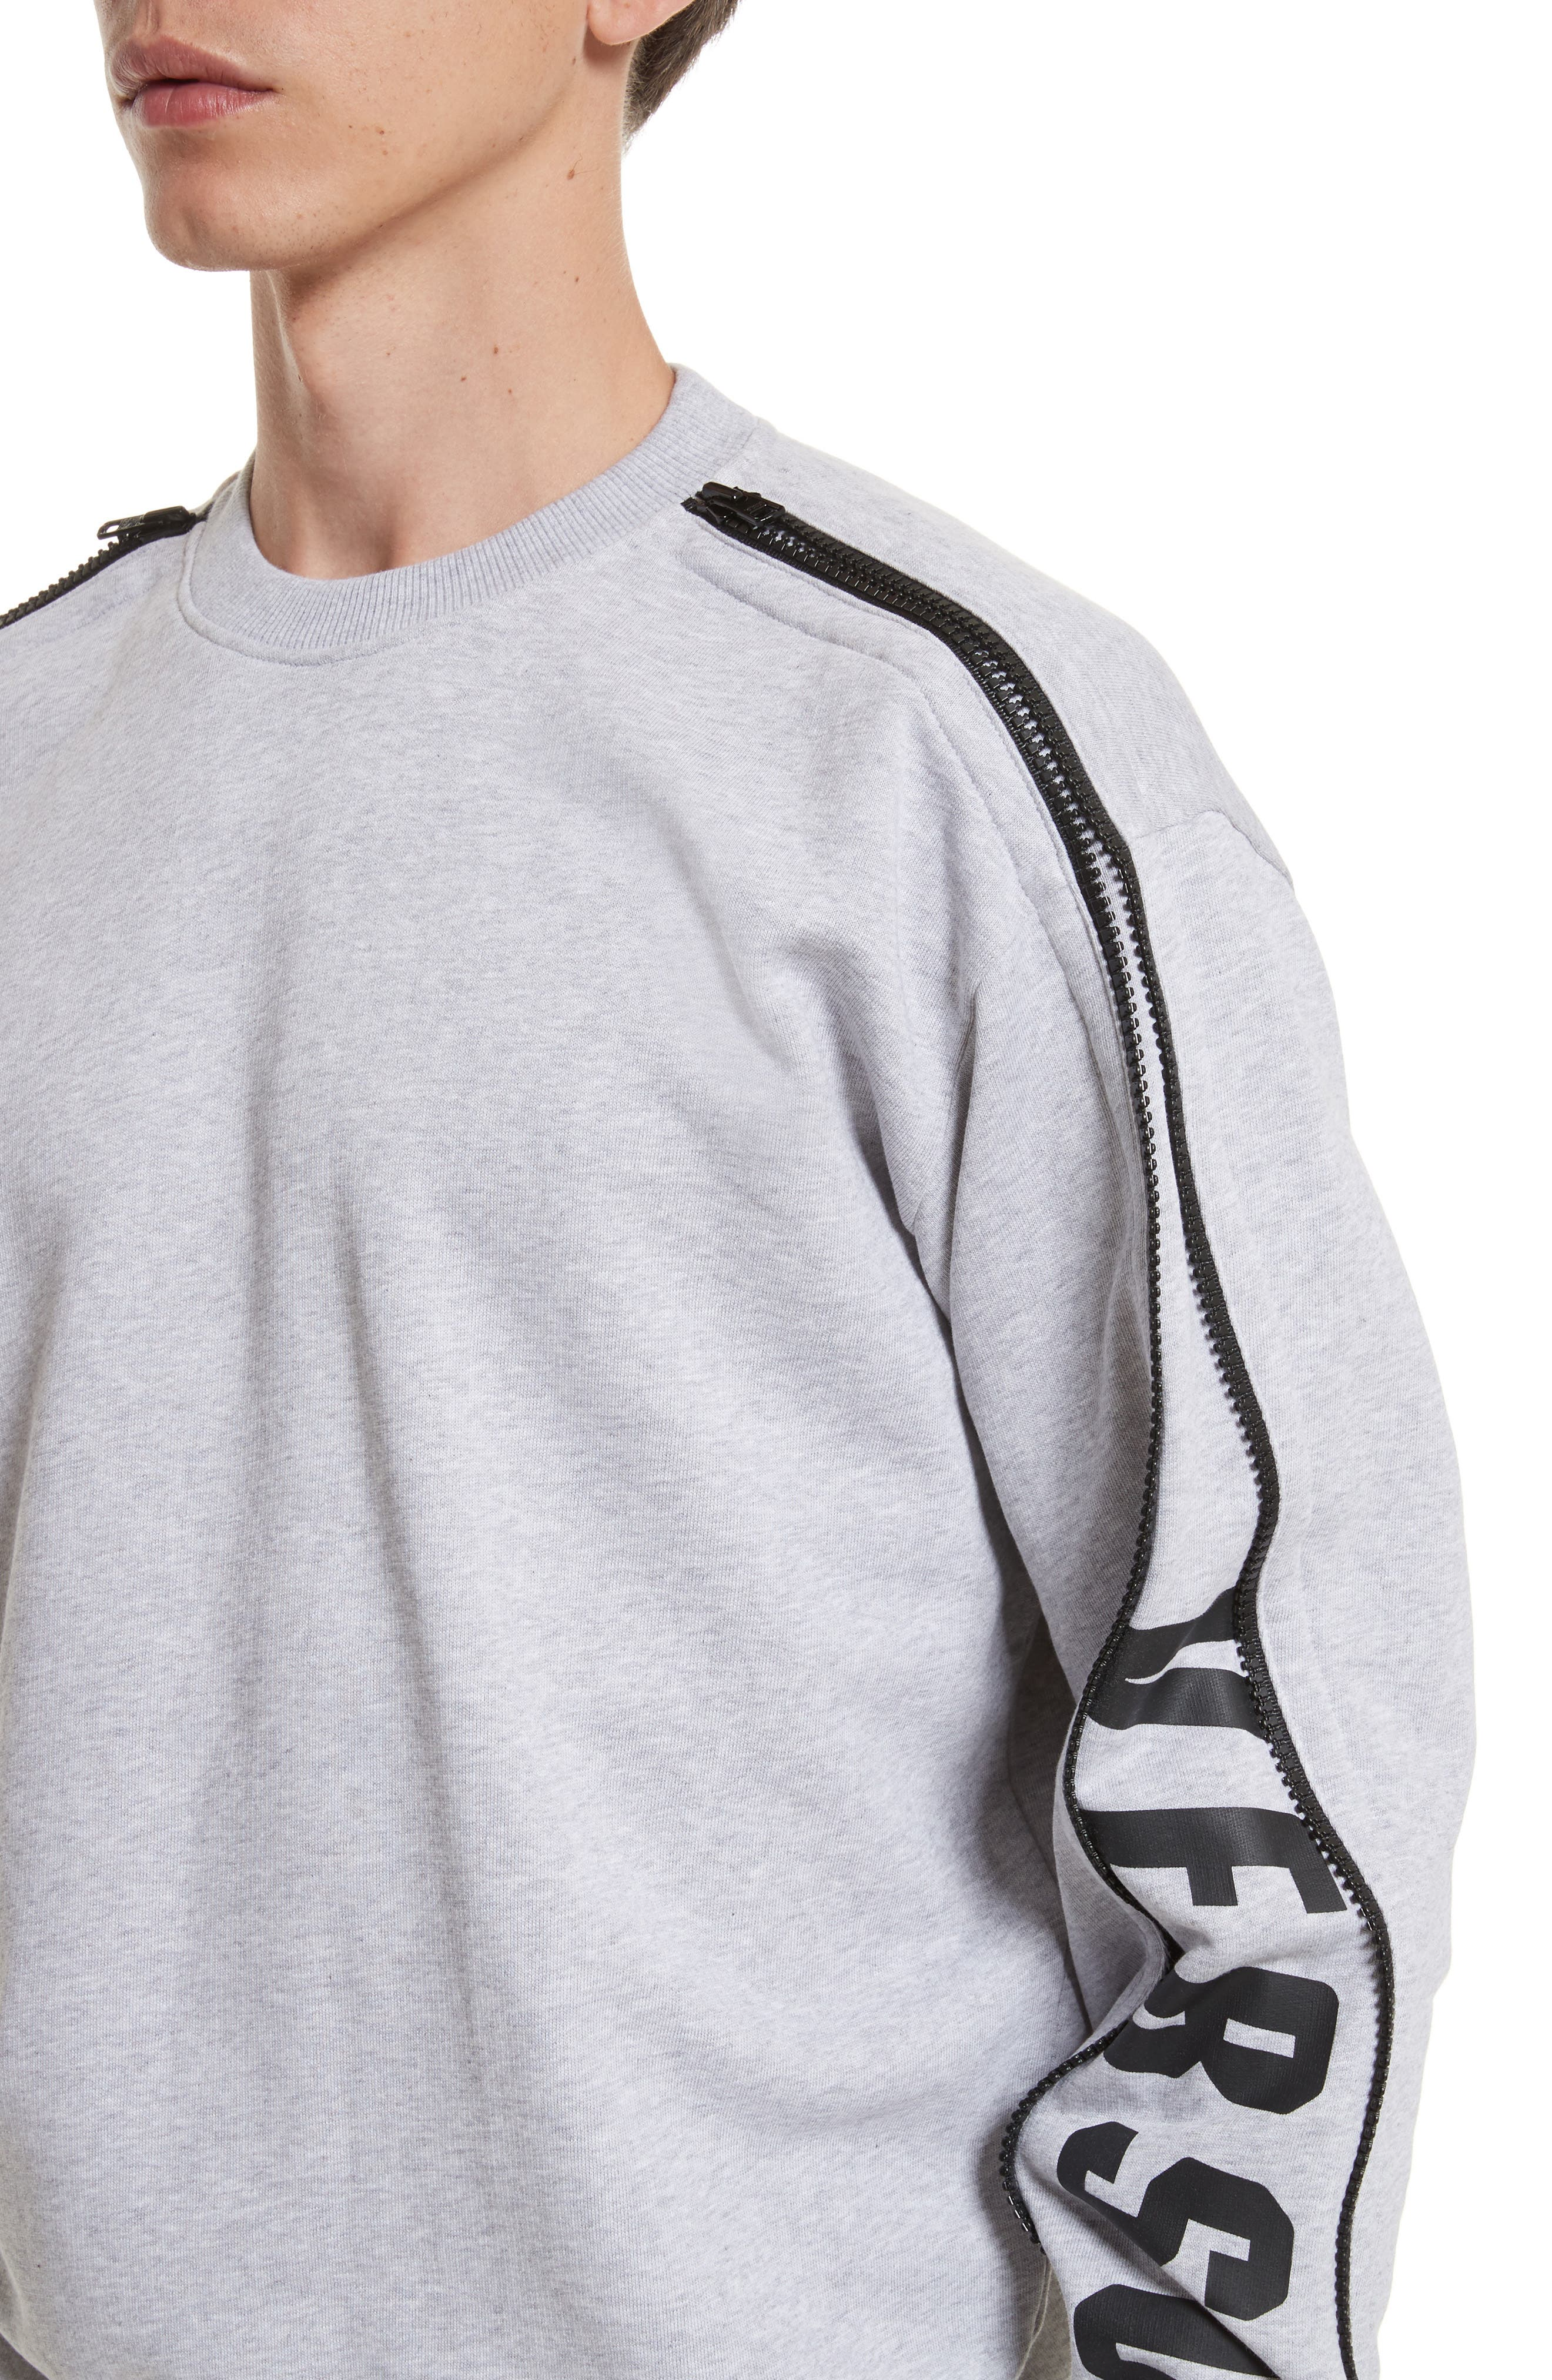 Zip Sleeve Crewneck Sweatshirt,                             Alternate thumbnail 4, color,                             GREY